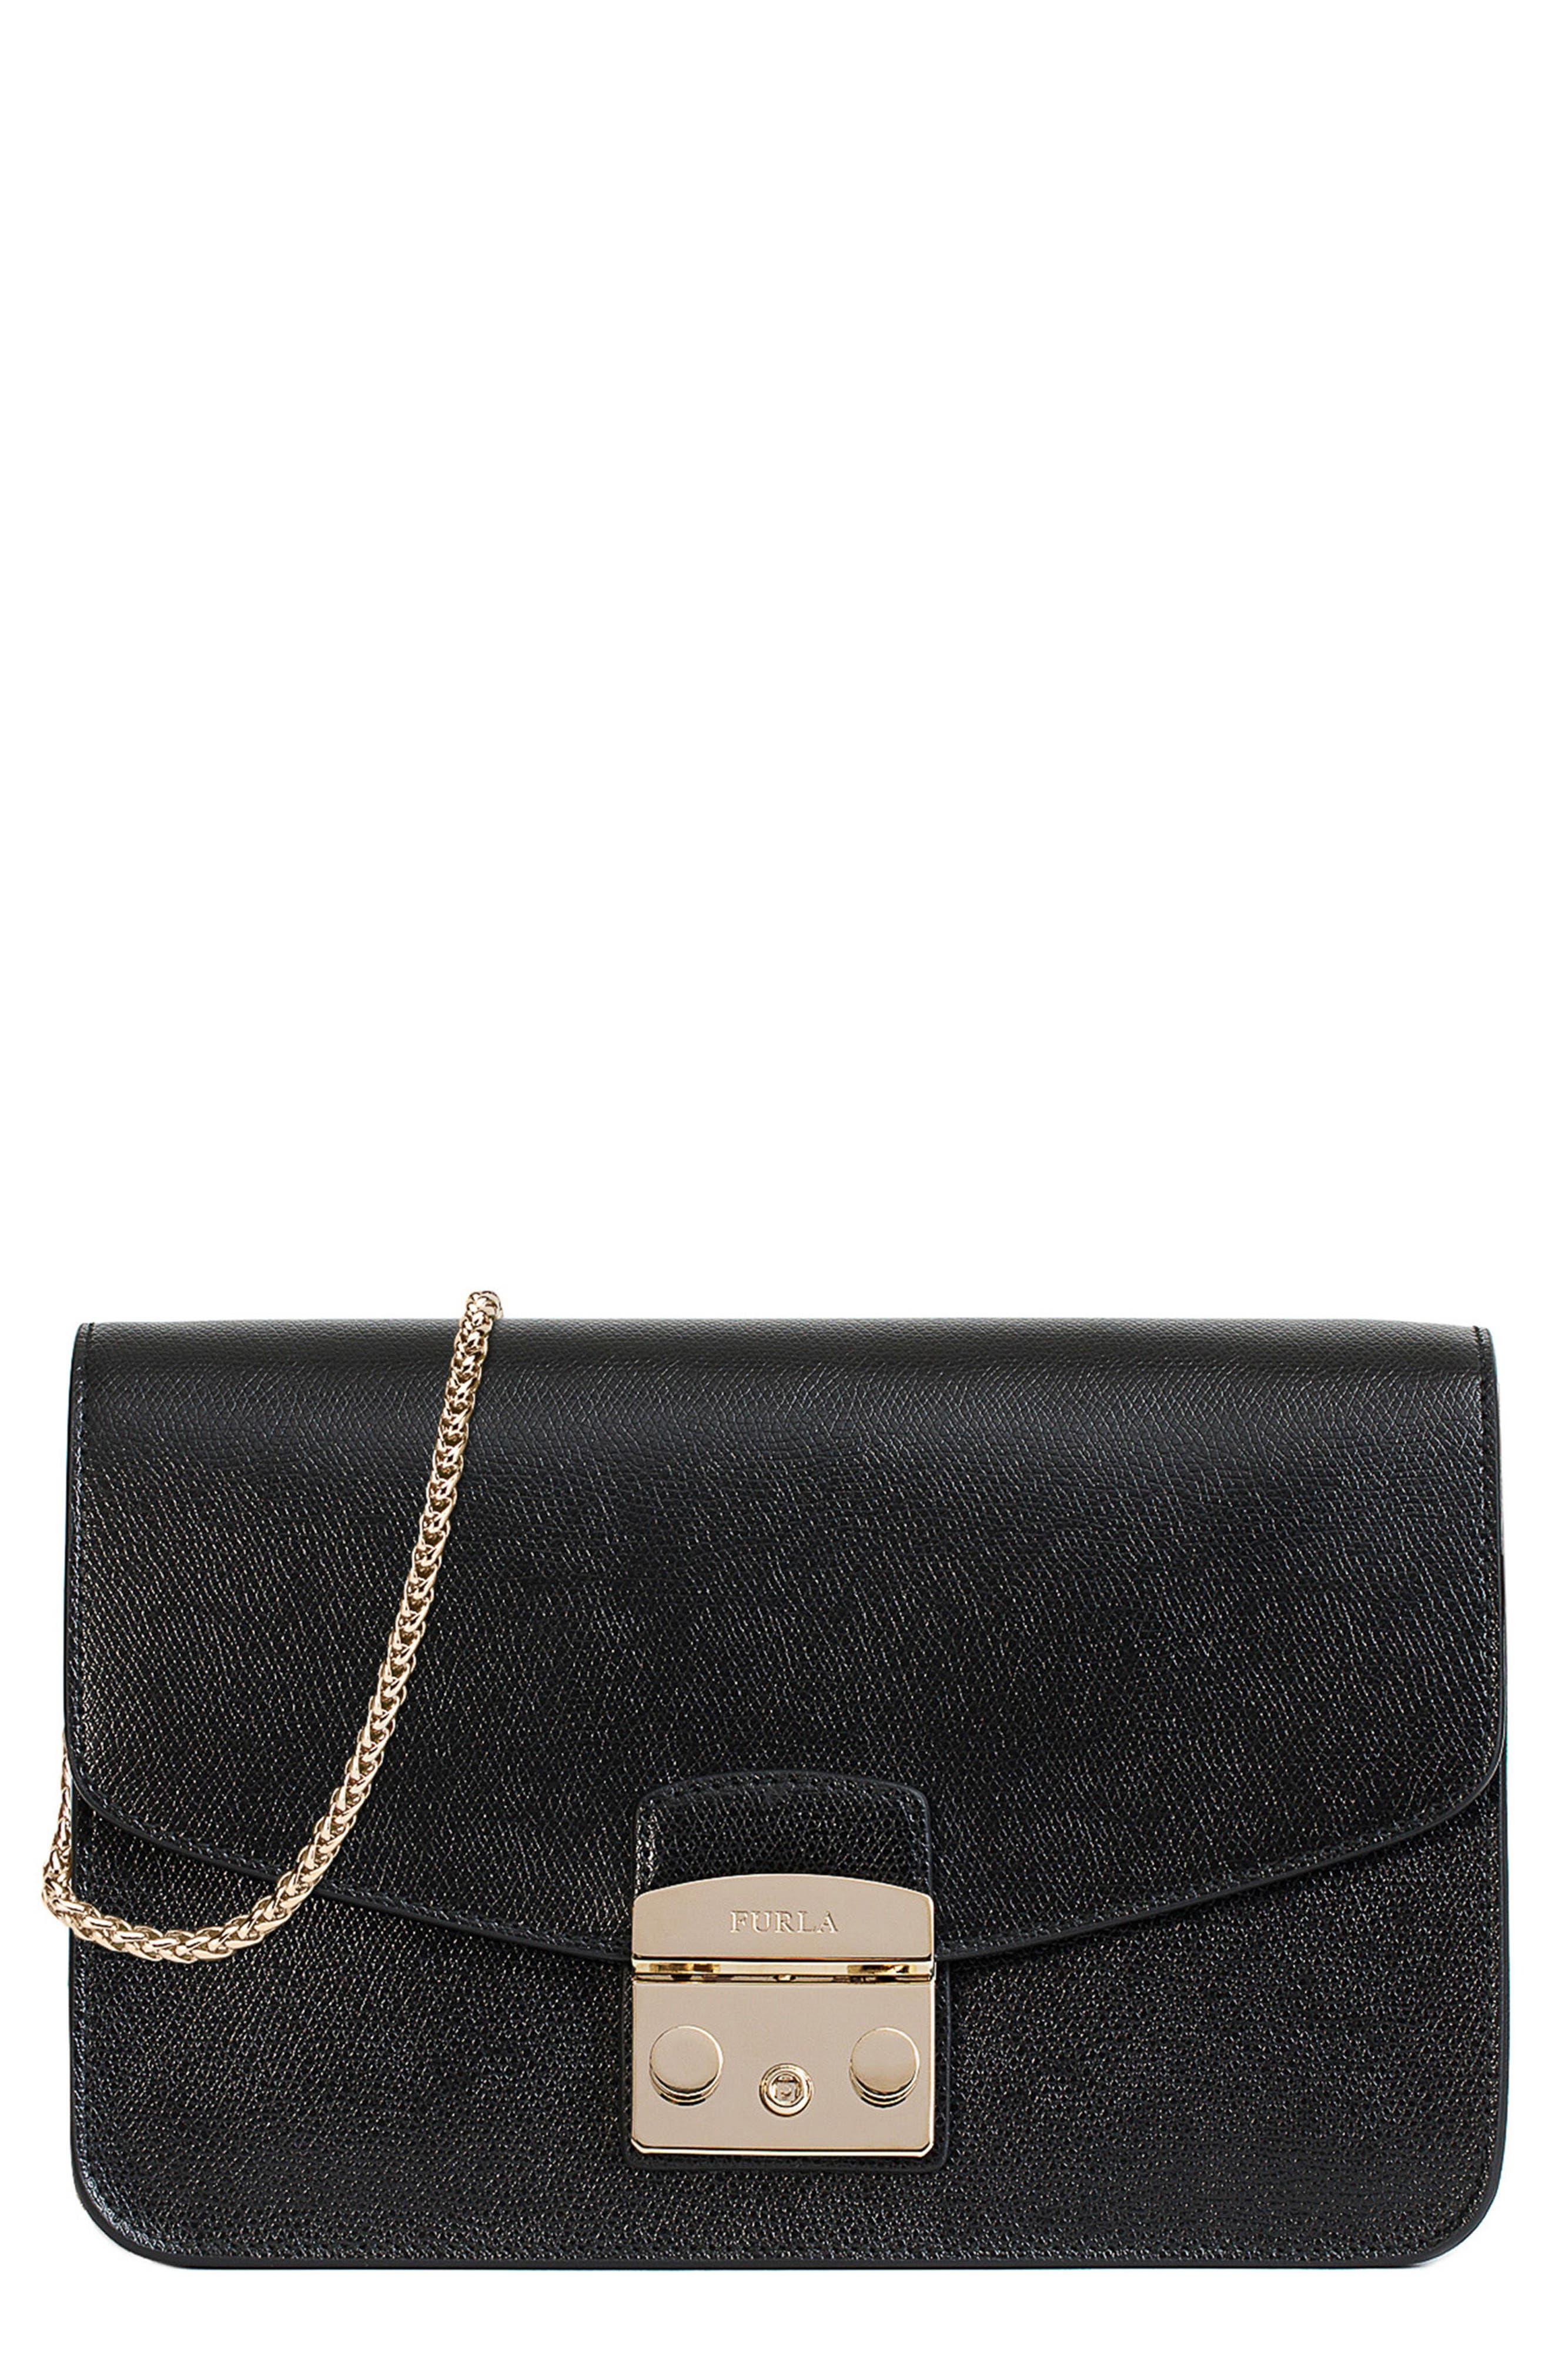 Small Metropolis Leather Crossbody Bag,                             Main thumbnail 1, color,                             Onyx